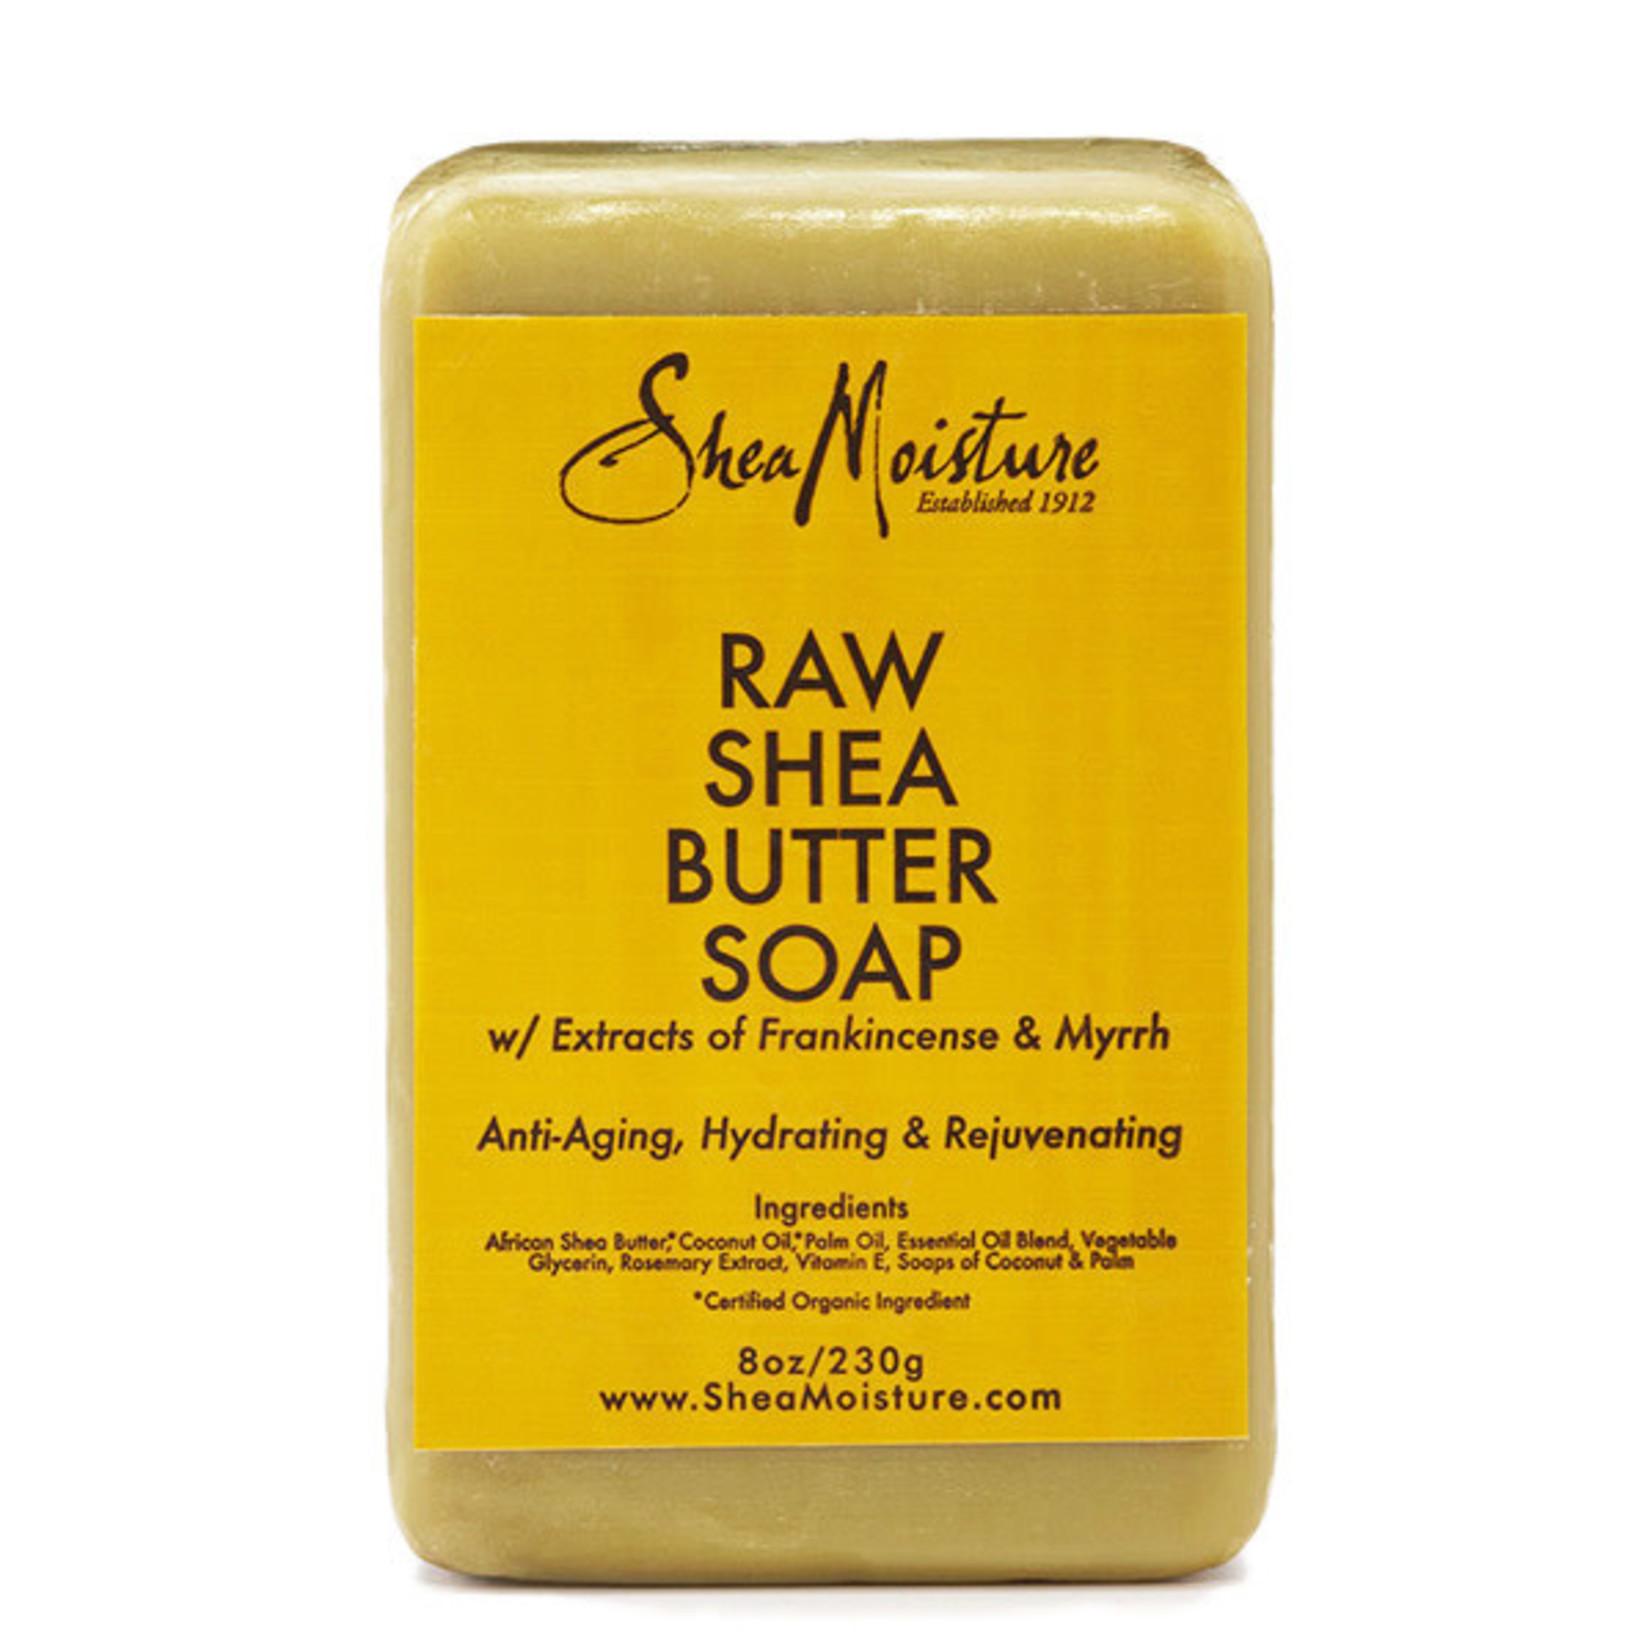 SHEA MOISTURE SHEA MOISTURE RAW SHEA BUTTER SOAP [8OZ]